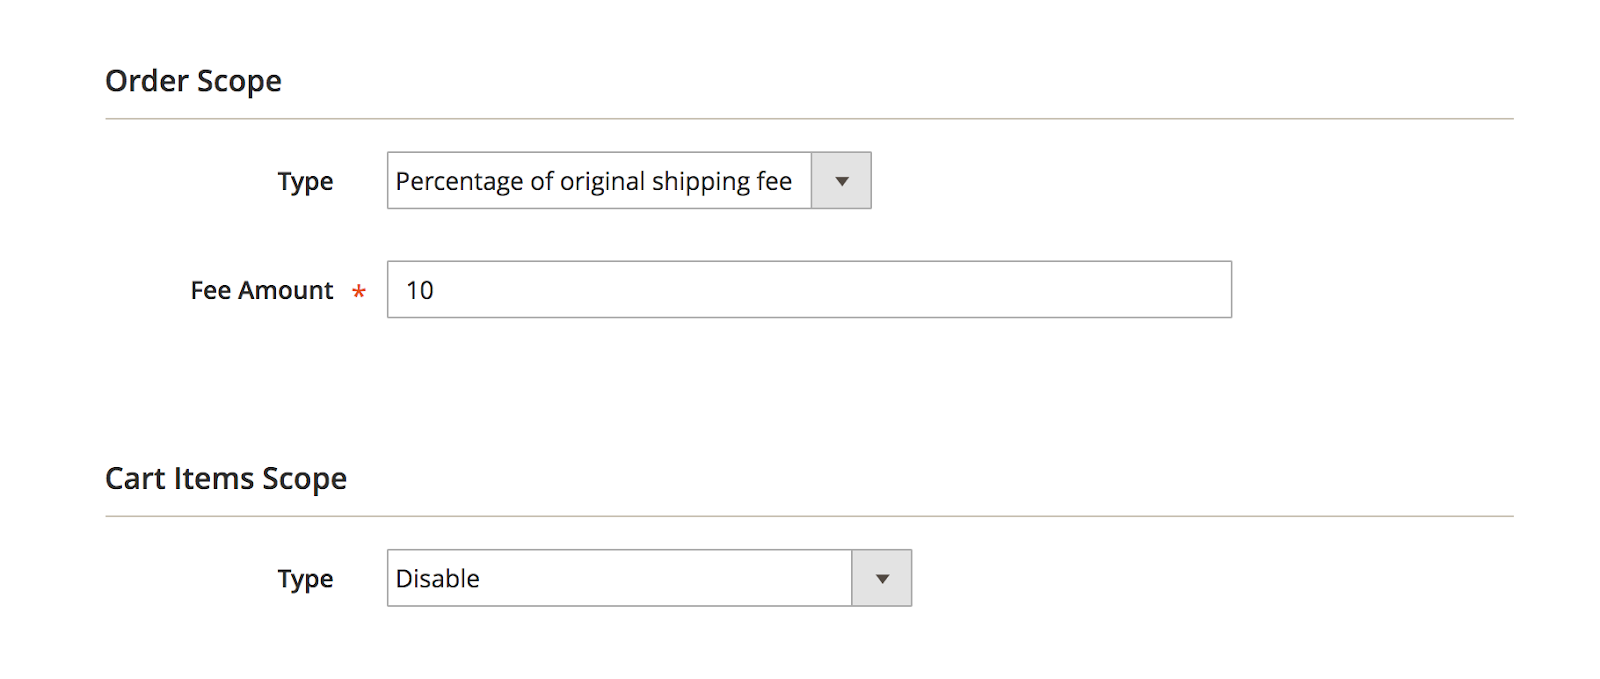 Set Percentage of original shipping fee